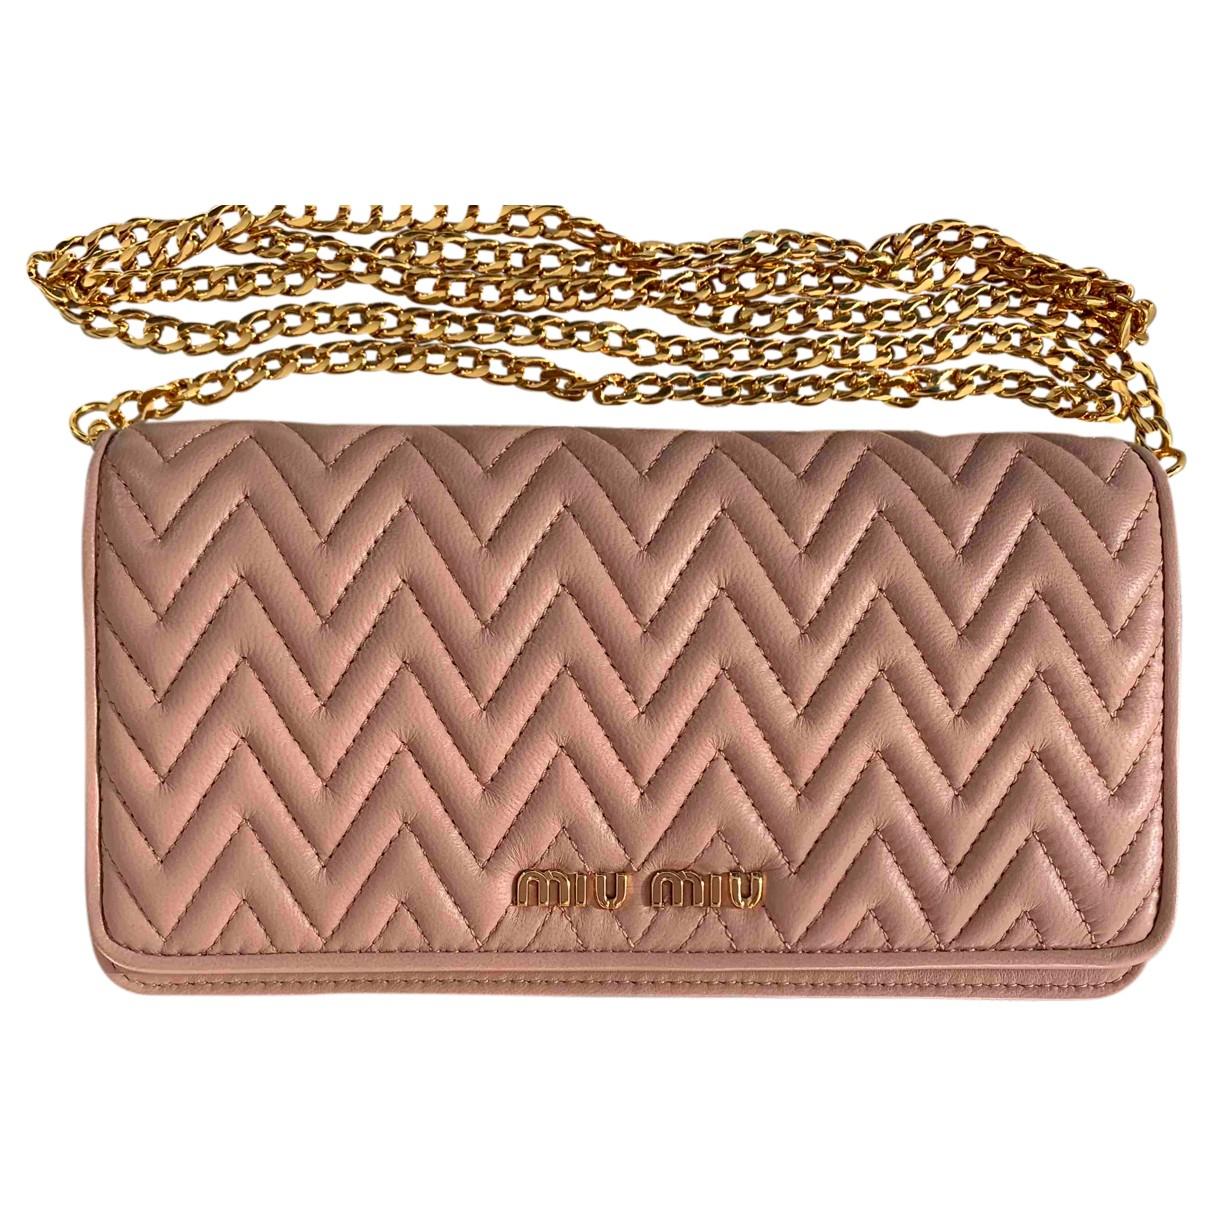 Miu Miu Miu delice Pink Leather handbag for Women N